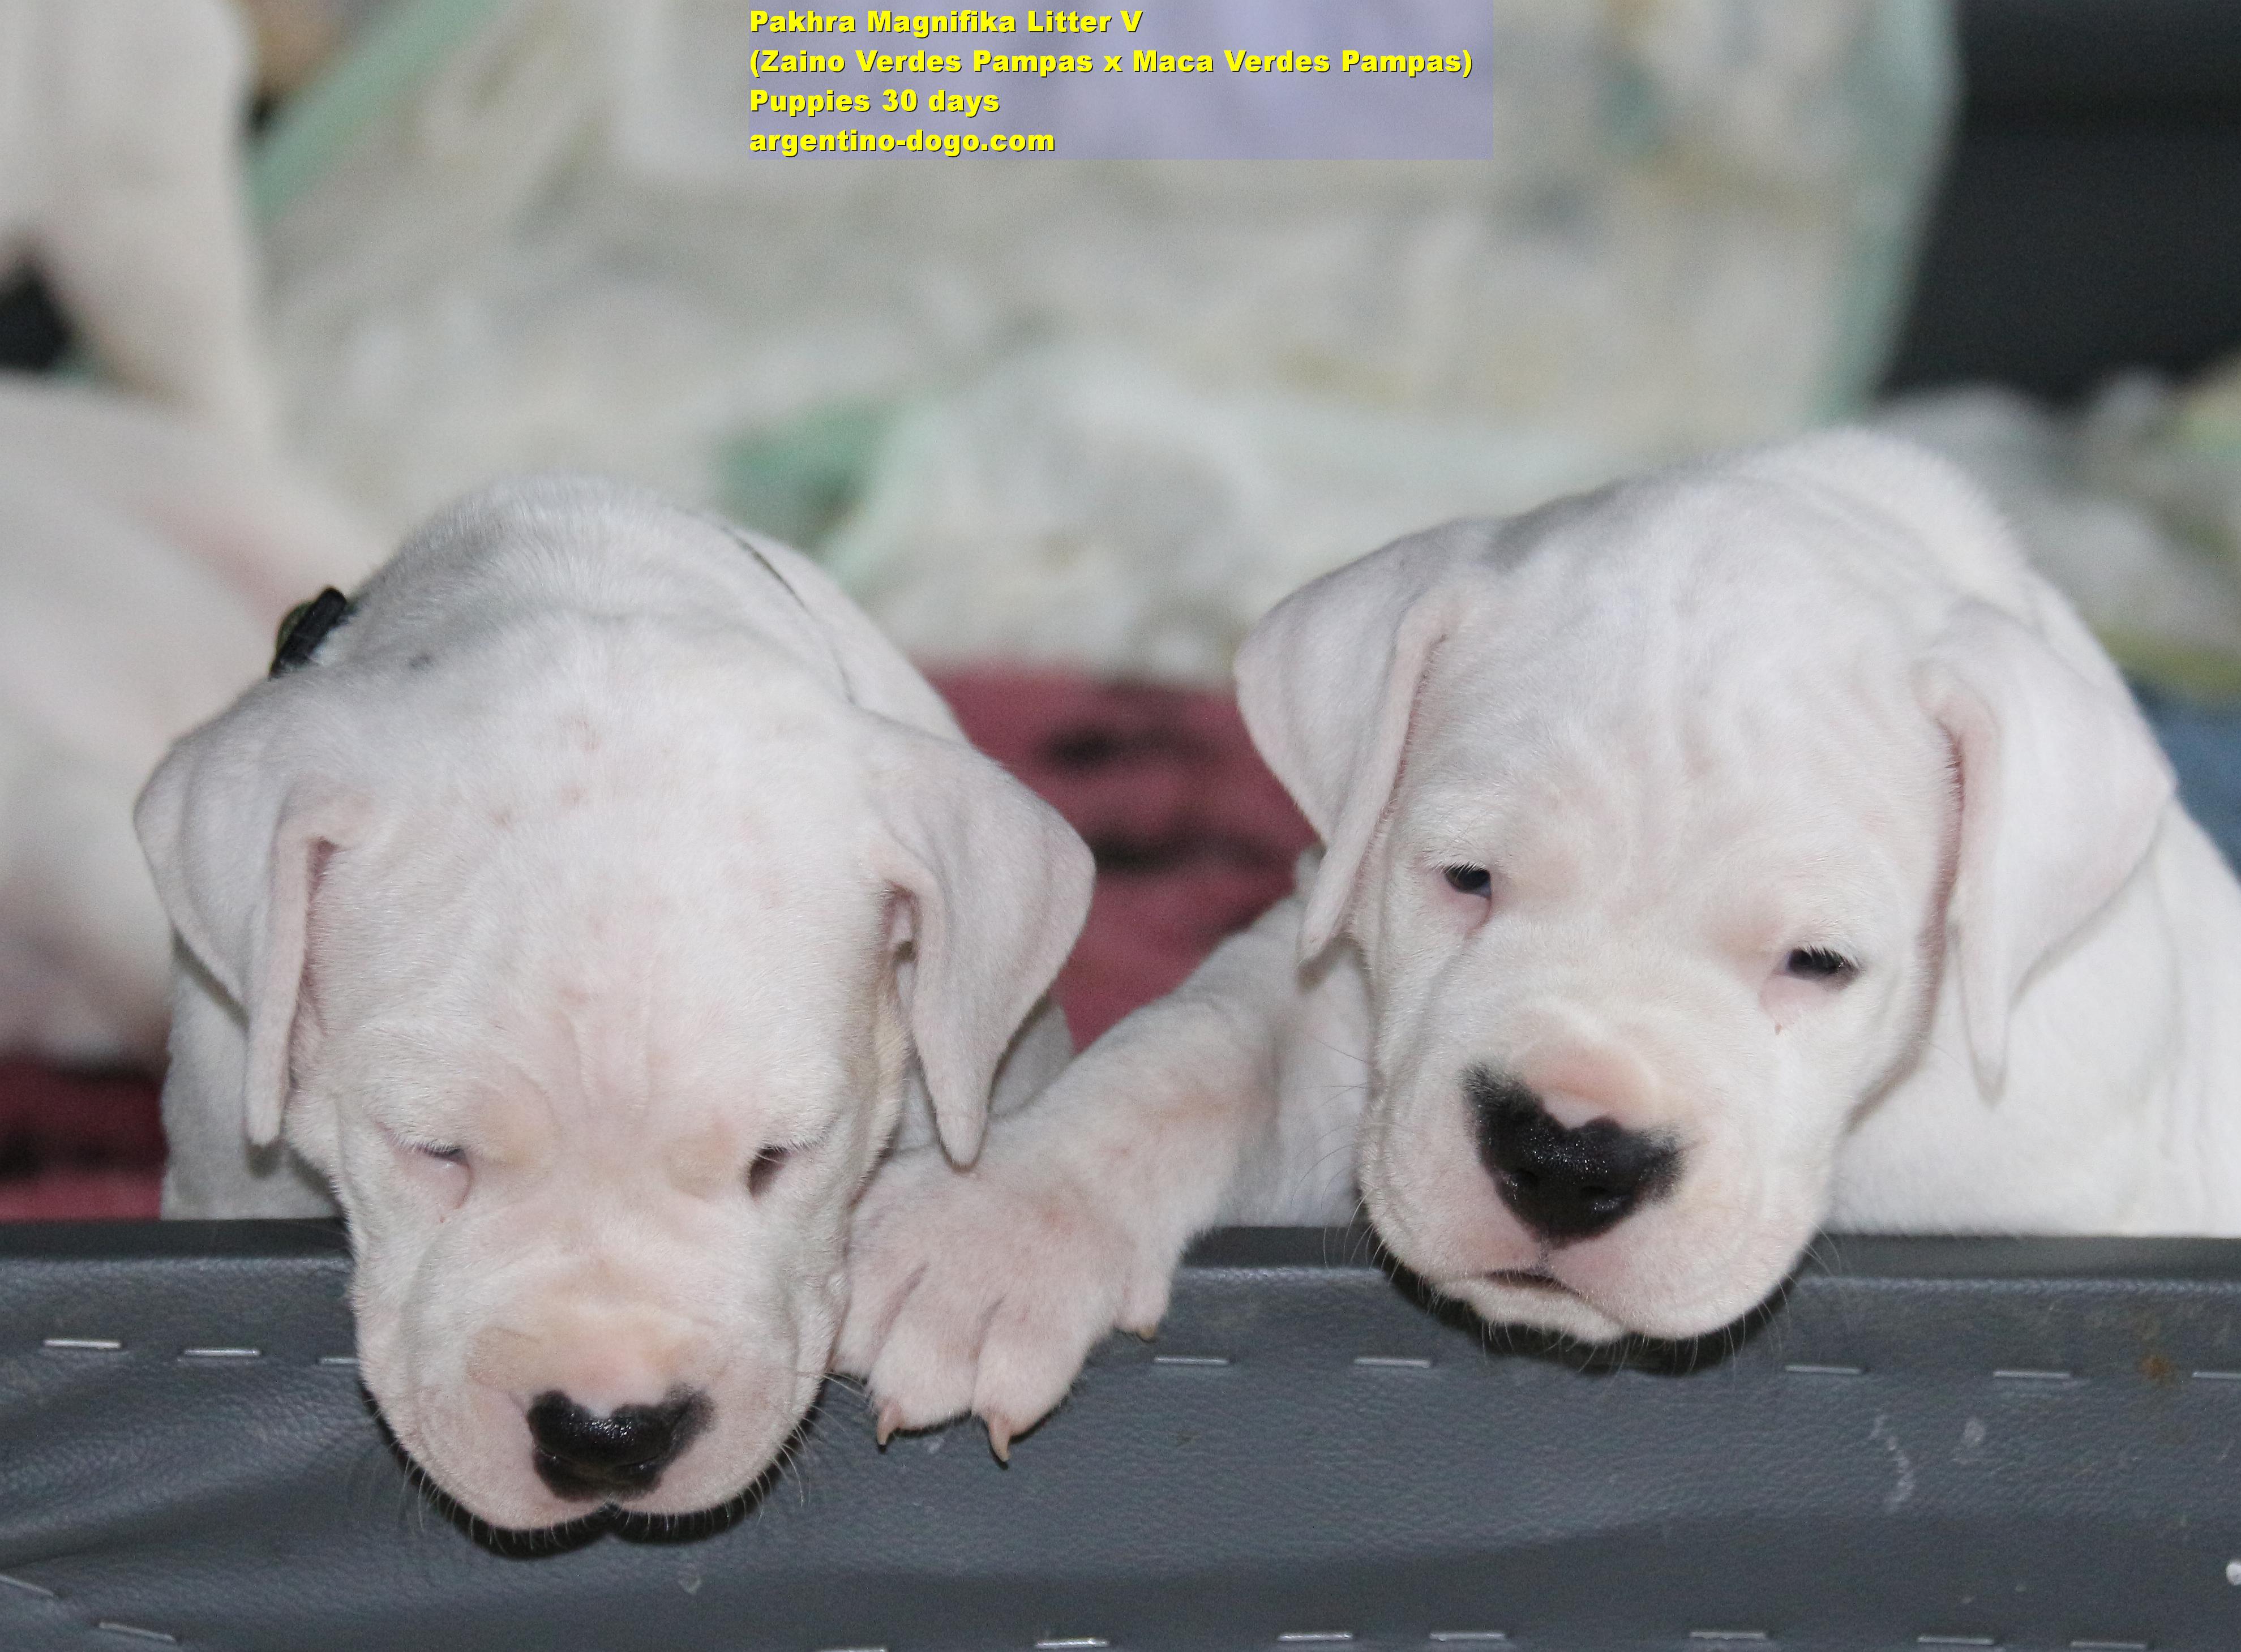 Pakhra Magnifika Puppies Litter V